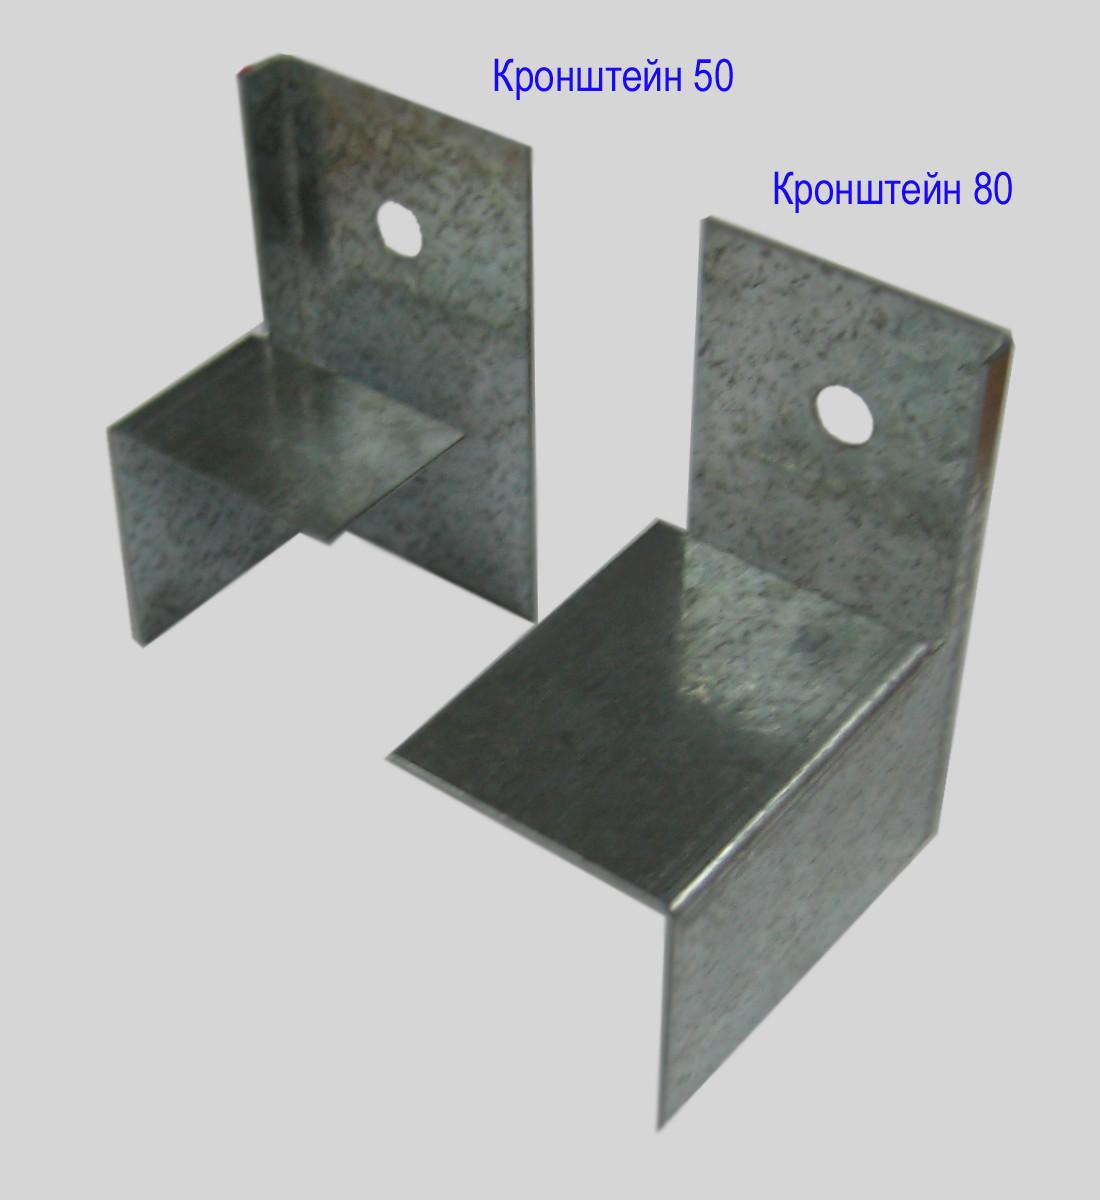 Кронштейн оцинкованный КР-100, тол. 2 мм